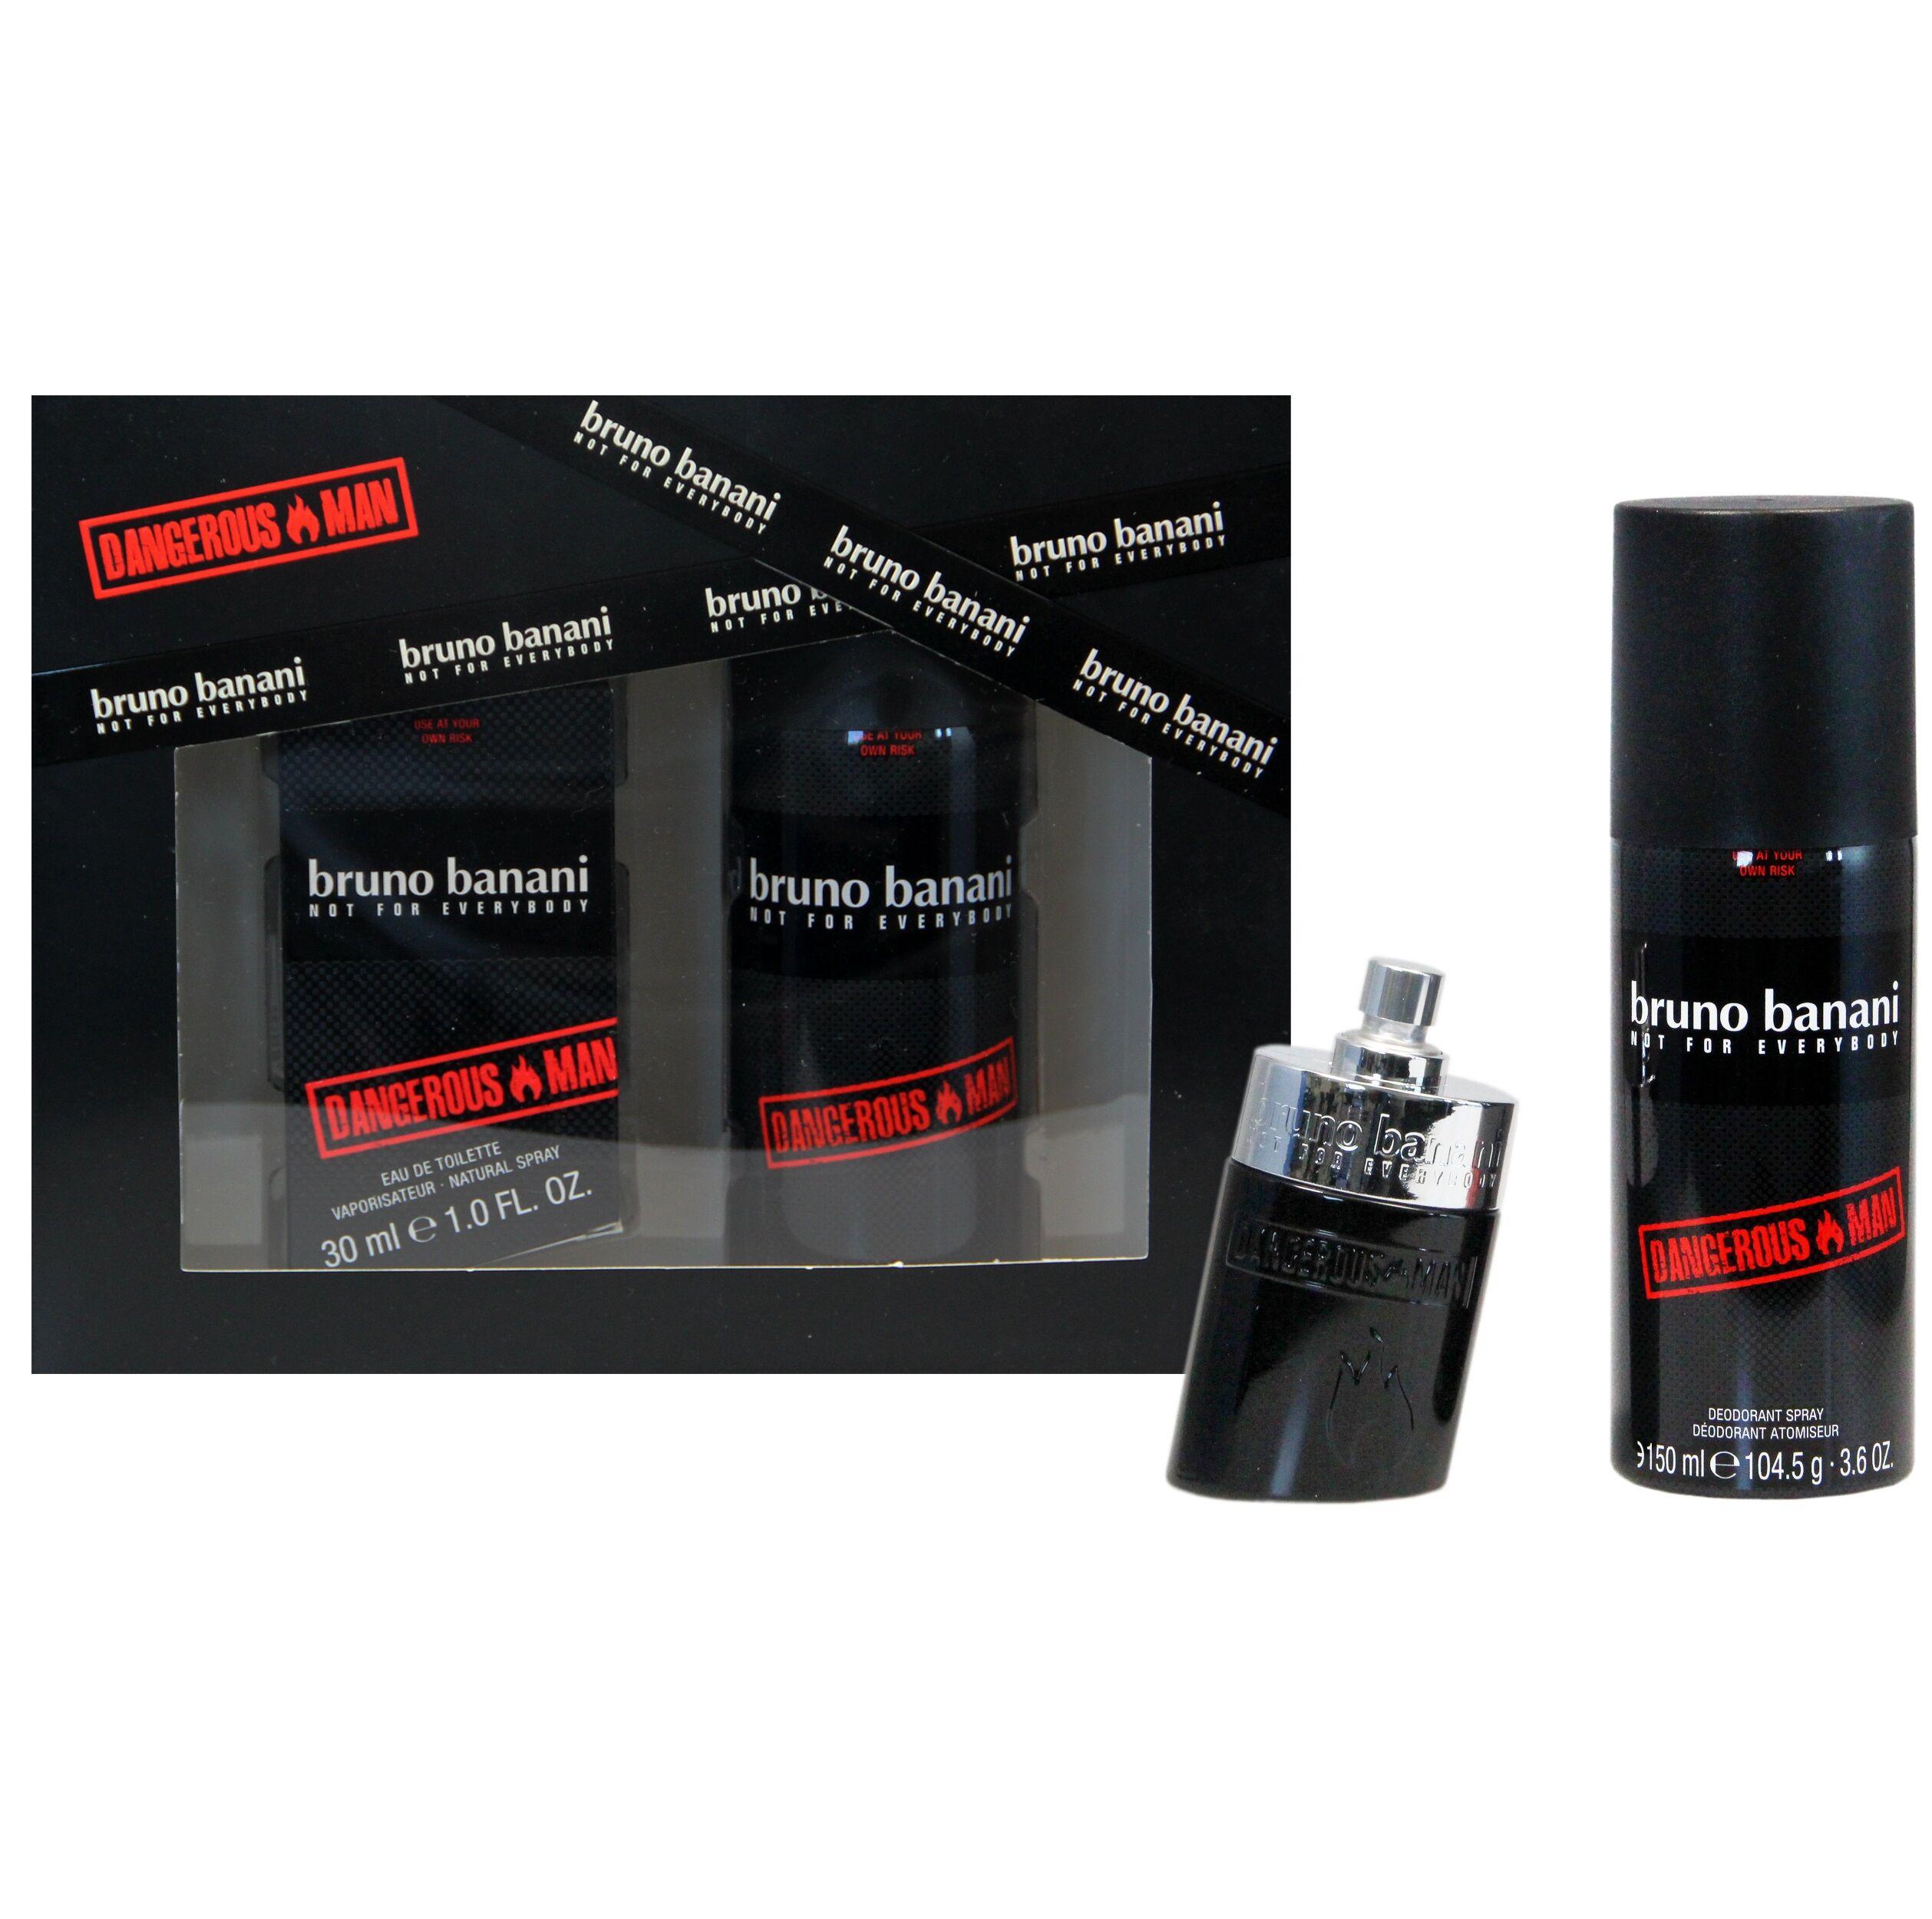 Bruno Banani Dangerous Man EDT 30 ml + Deo Spray 150 ml Giftset